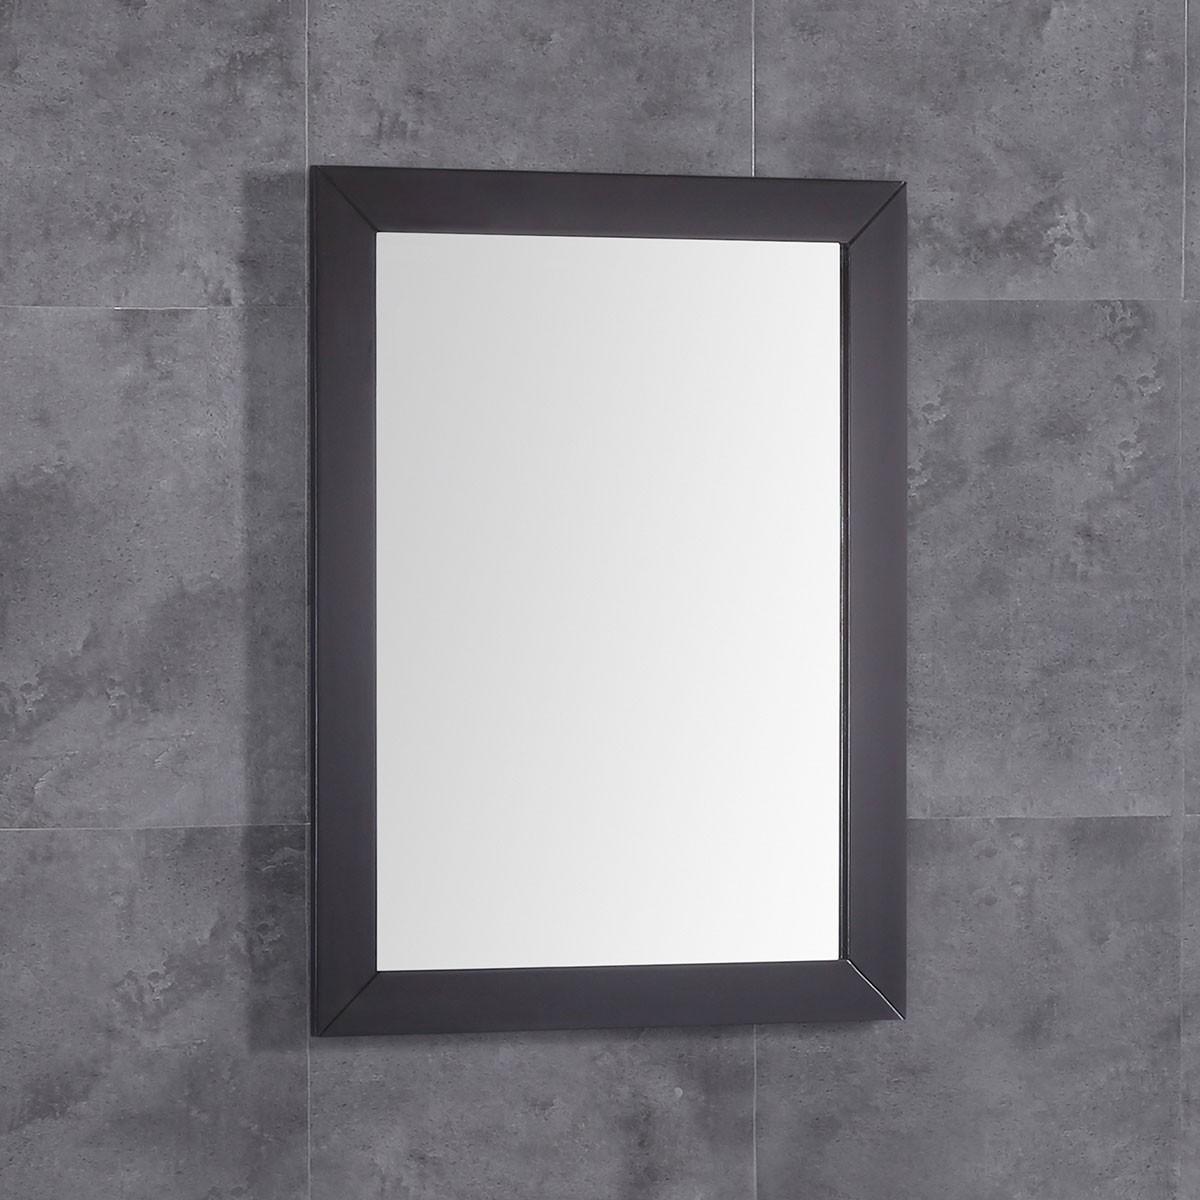 24 x 32 In. Wood Frame Mirror (DK-T9152A-M)